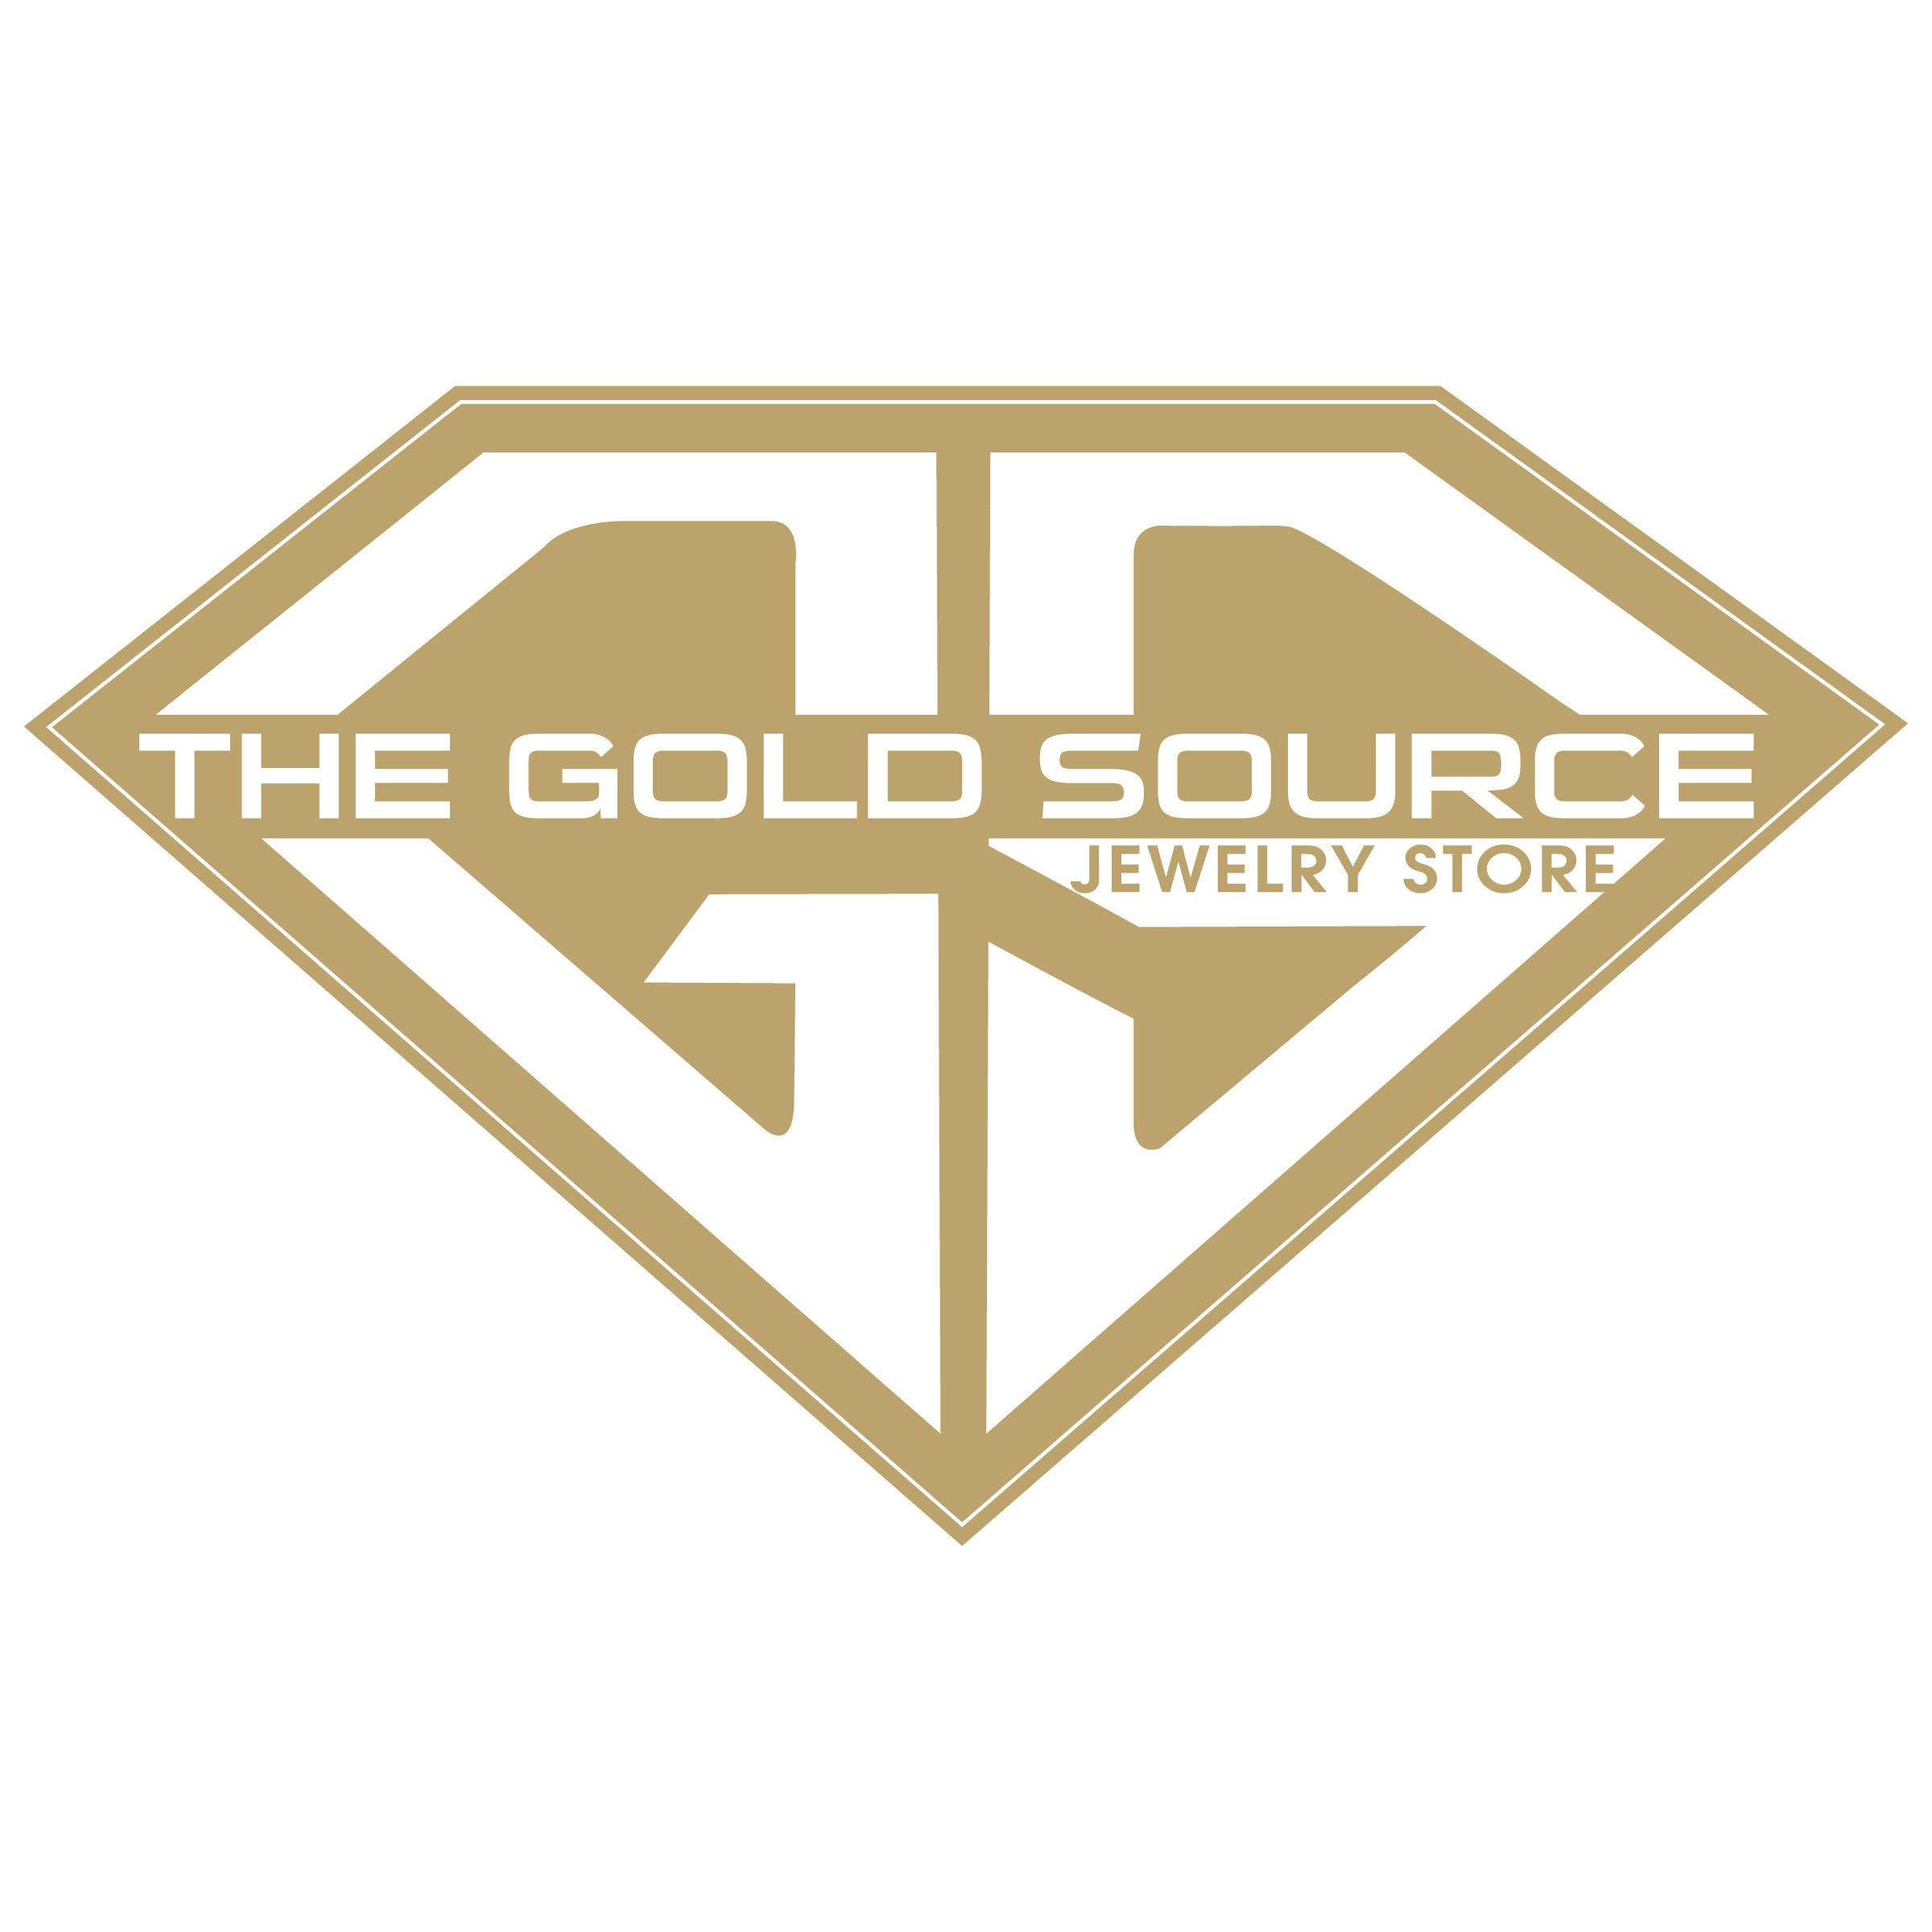 8x8-GOLDSOURCE-01.jpg